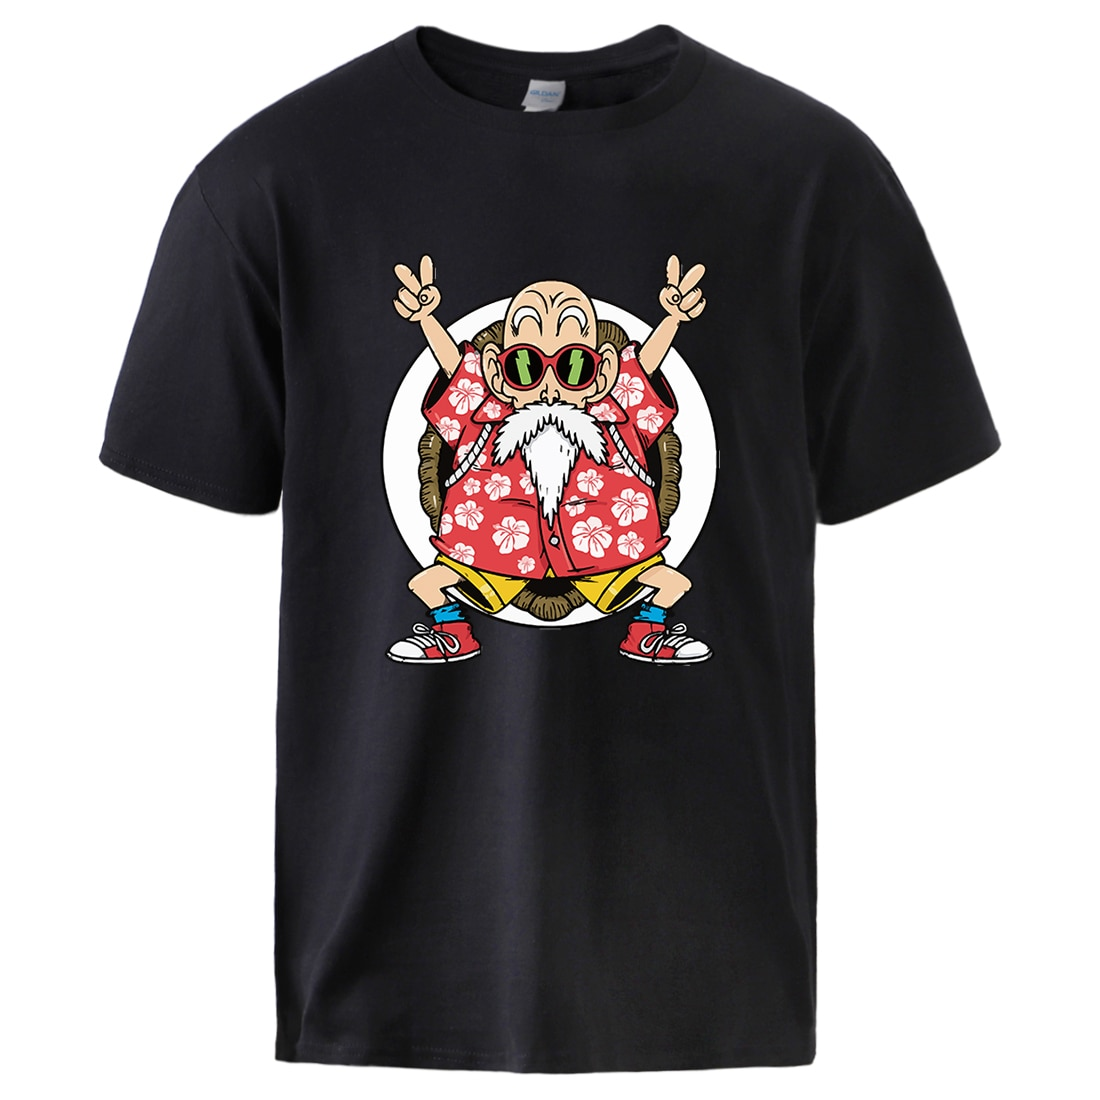 Dragon Ball maestro Roshi impresión T camisas de hombre de algodón de verano Tops 2020 hombre marca de Venta caliente de manga corta Jersey ropa deportiva Casual